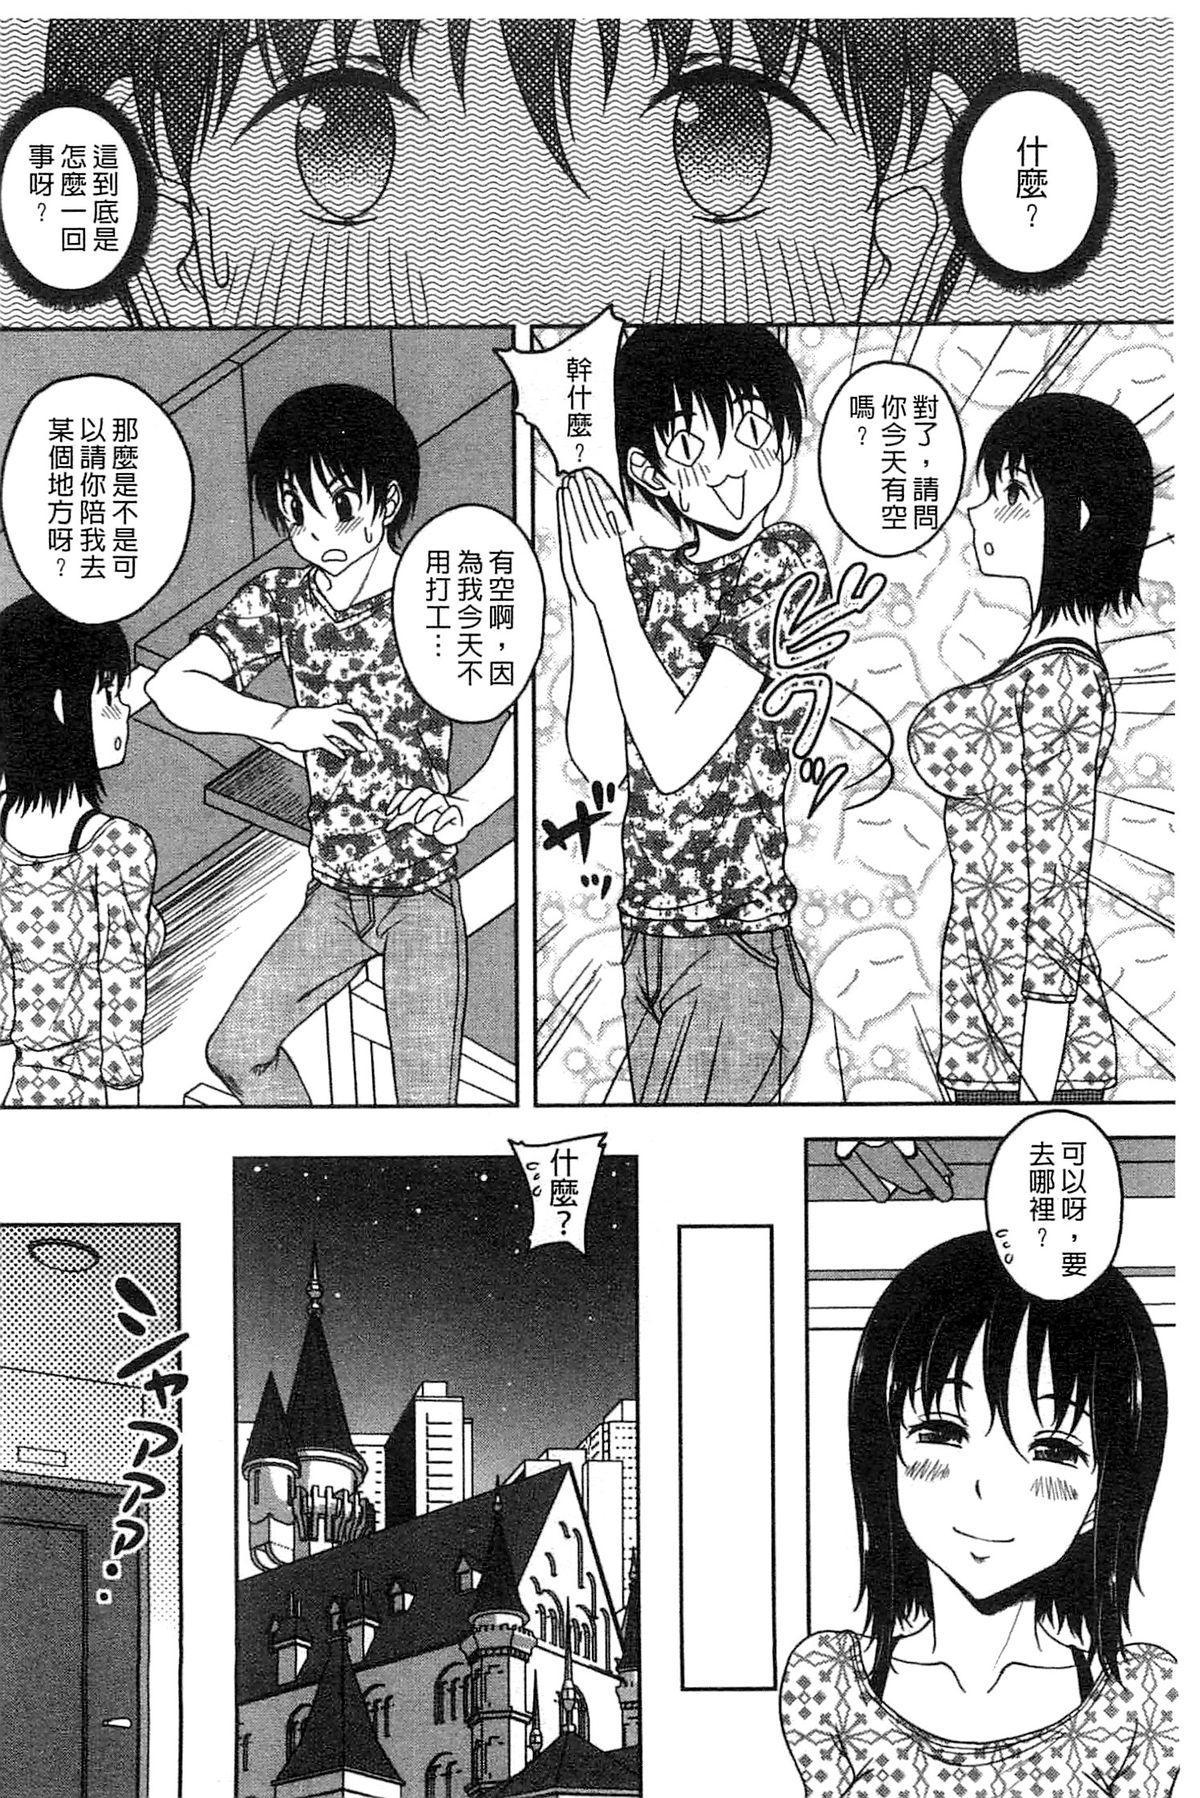 Hajimete nan dakara - First sexual experience 118